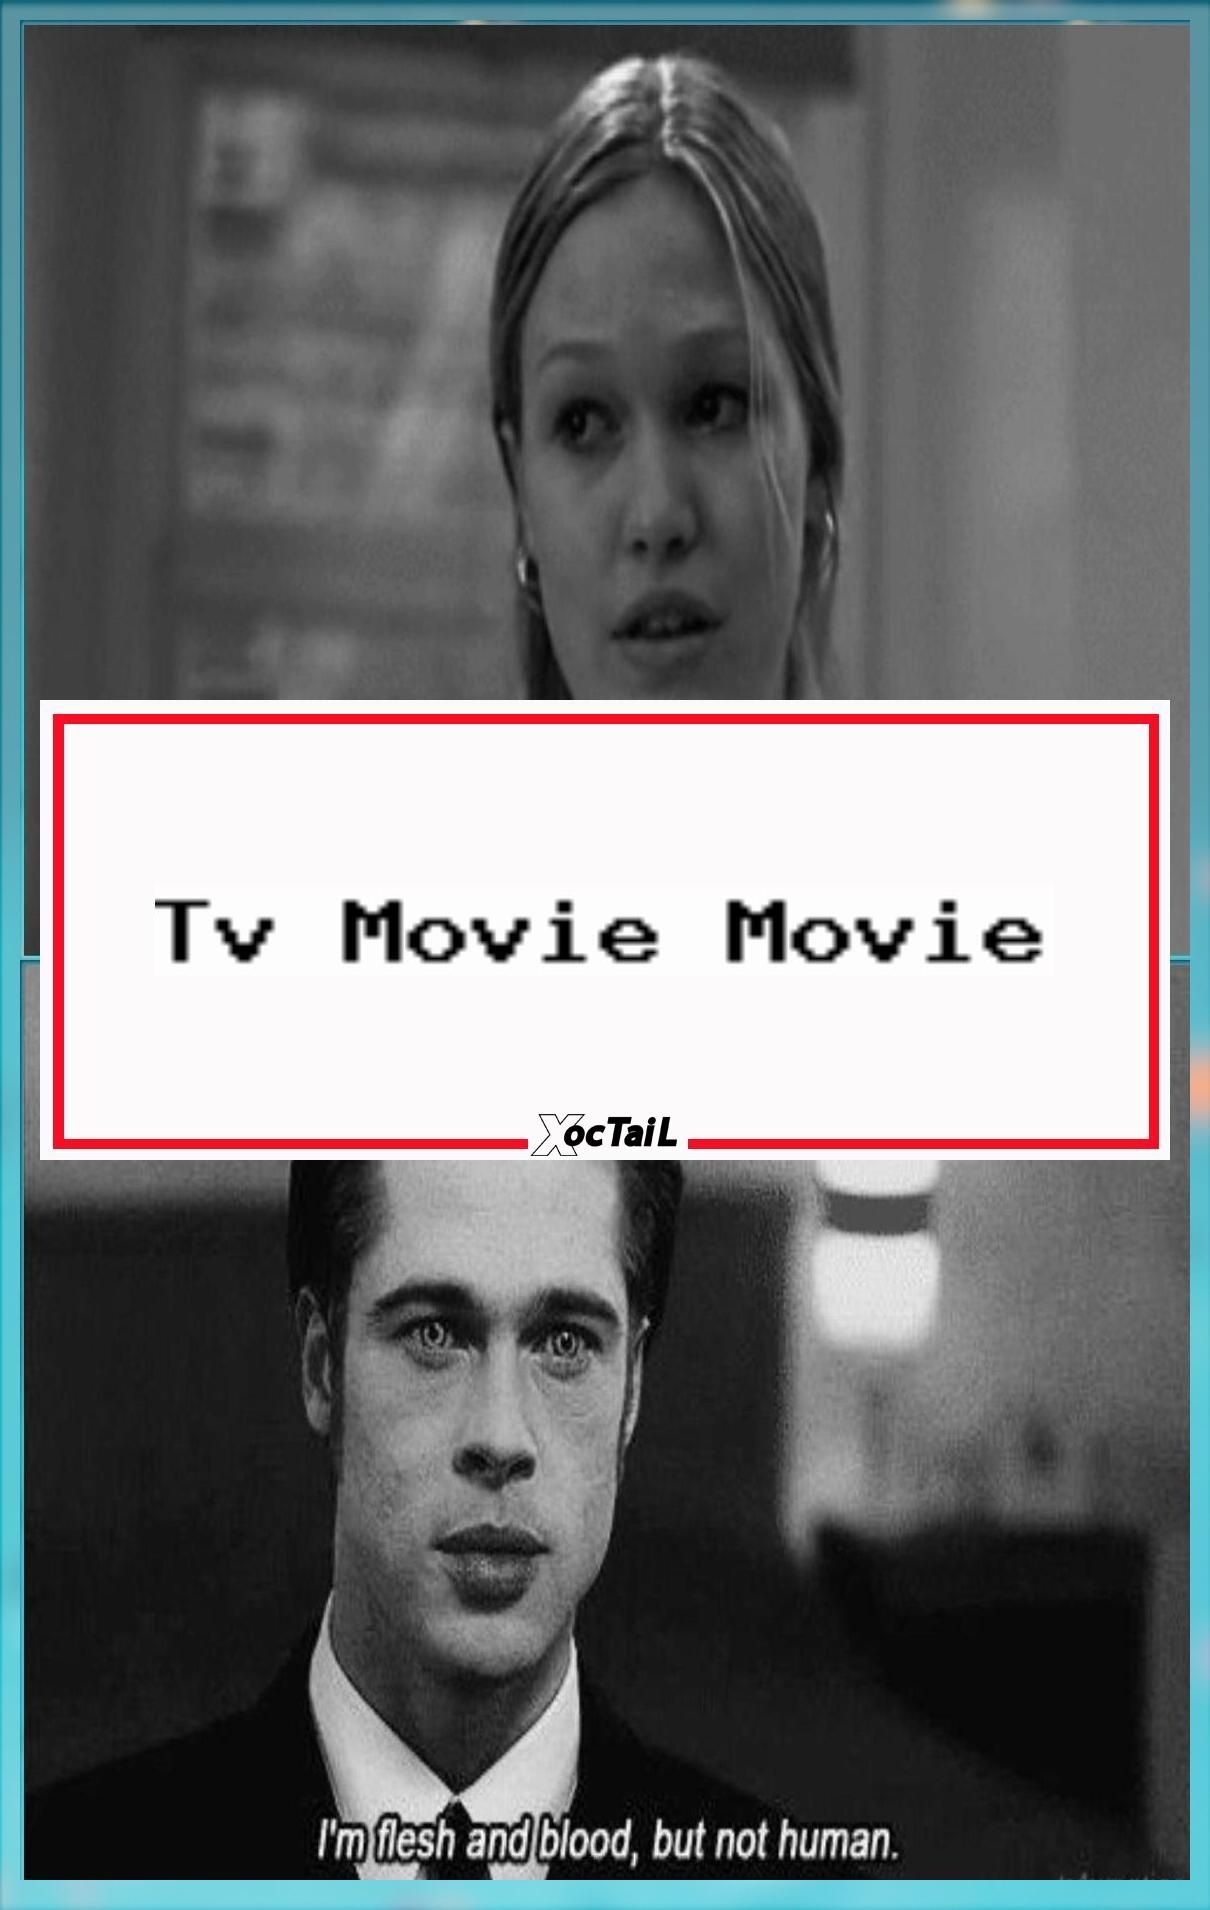 Tv Movie Movie Quotes Gif Find On Gifer Movie Quotes Funny Movie Love Quotes Popular Movie Quotes